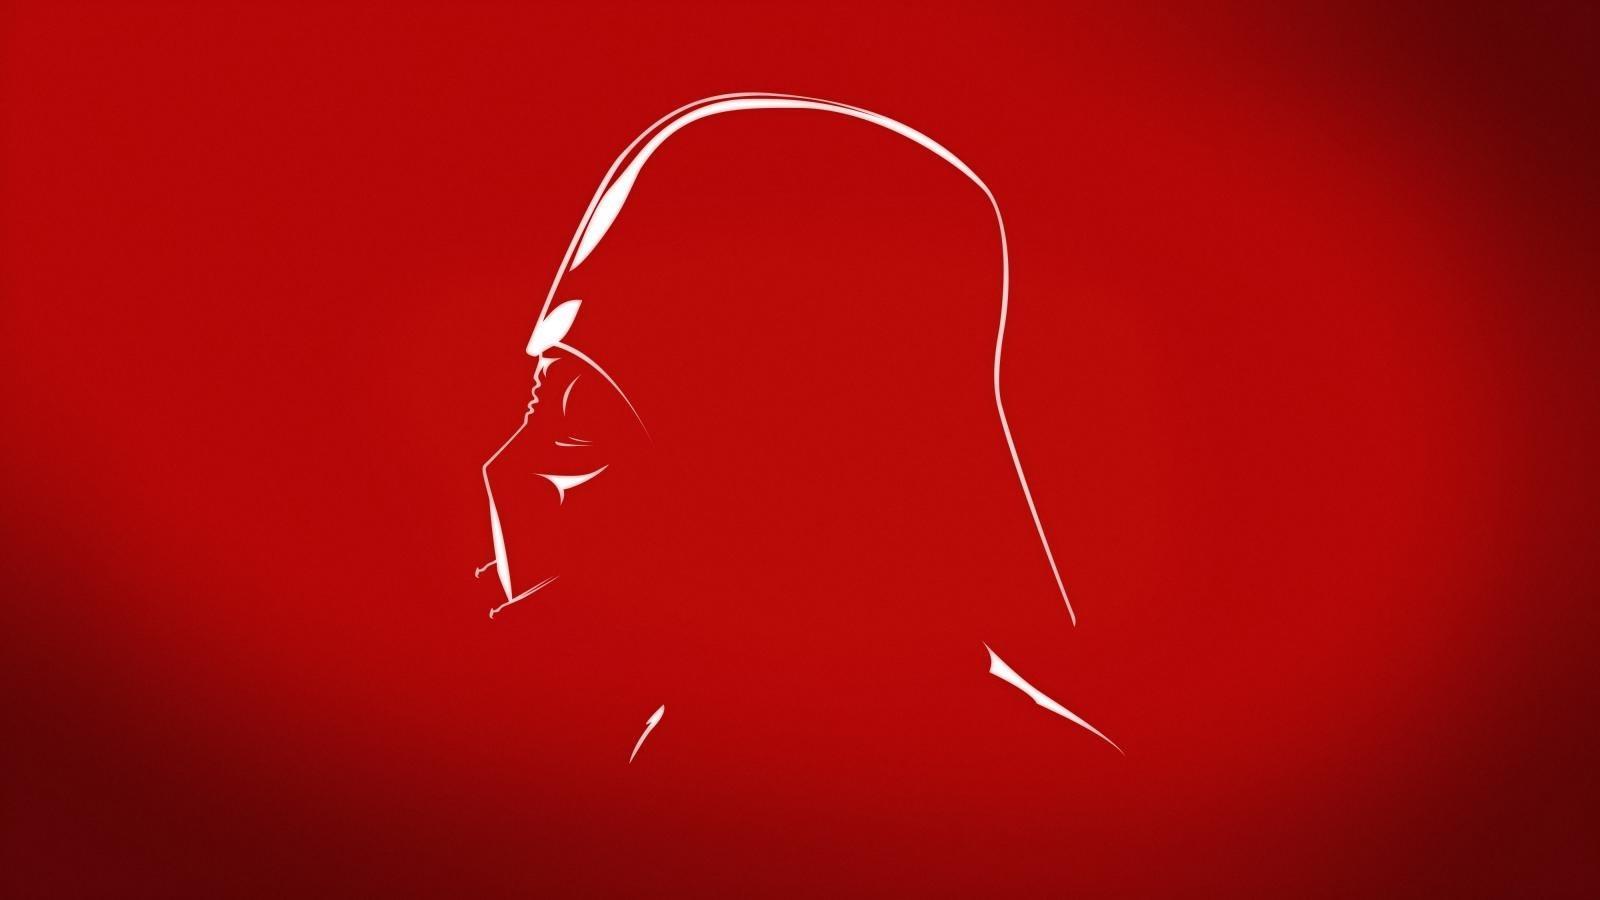 Black Red Minimalist Wallpapers - Top Free Black Red ...